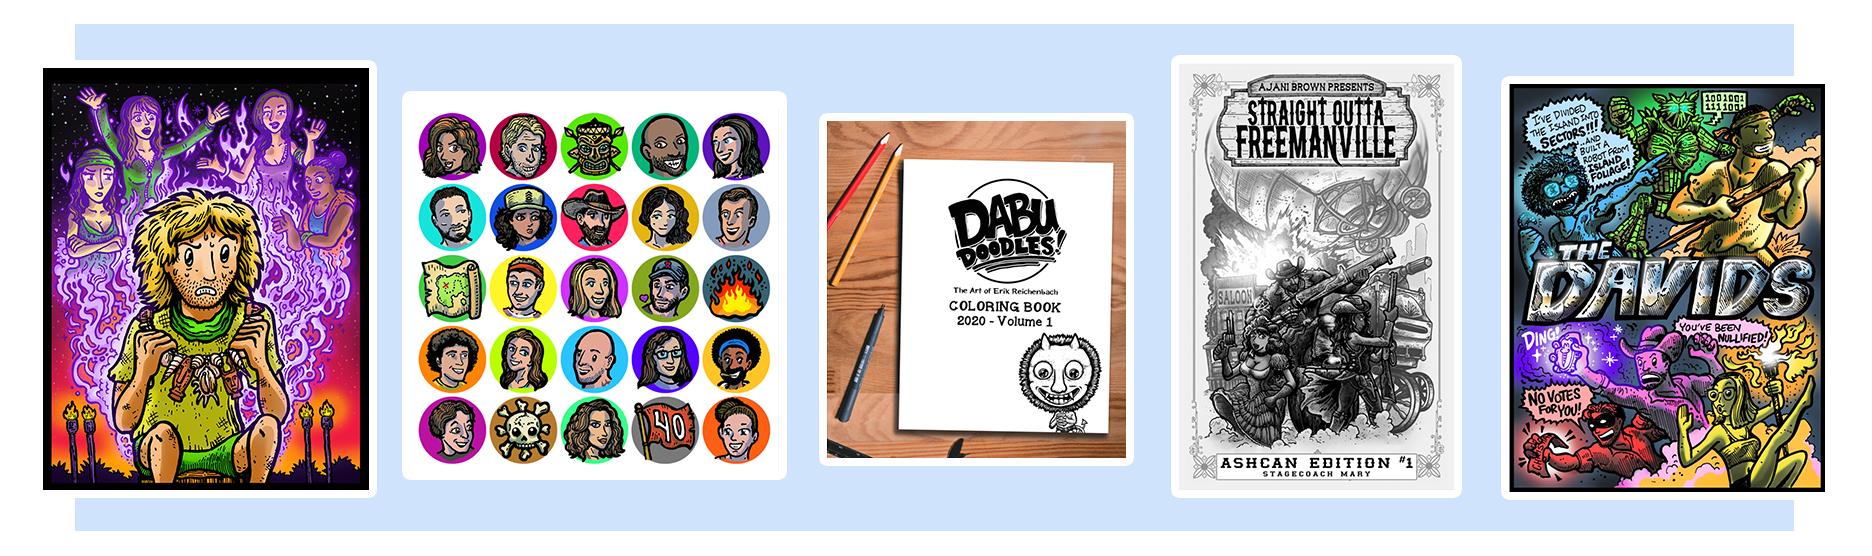 Dabu Doodles Print Shop